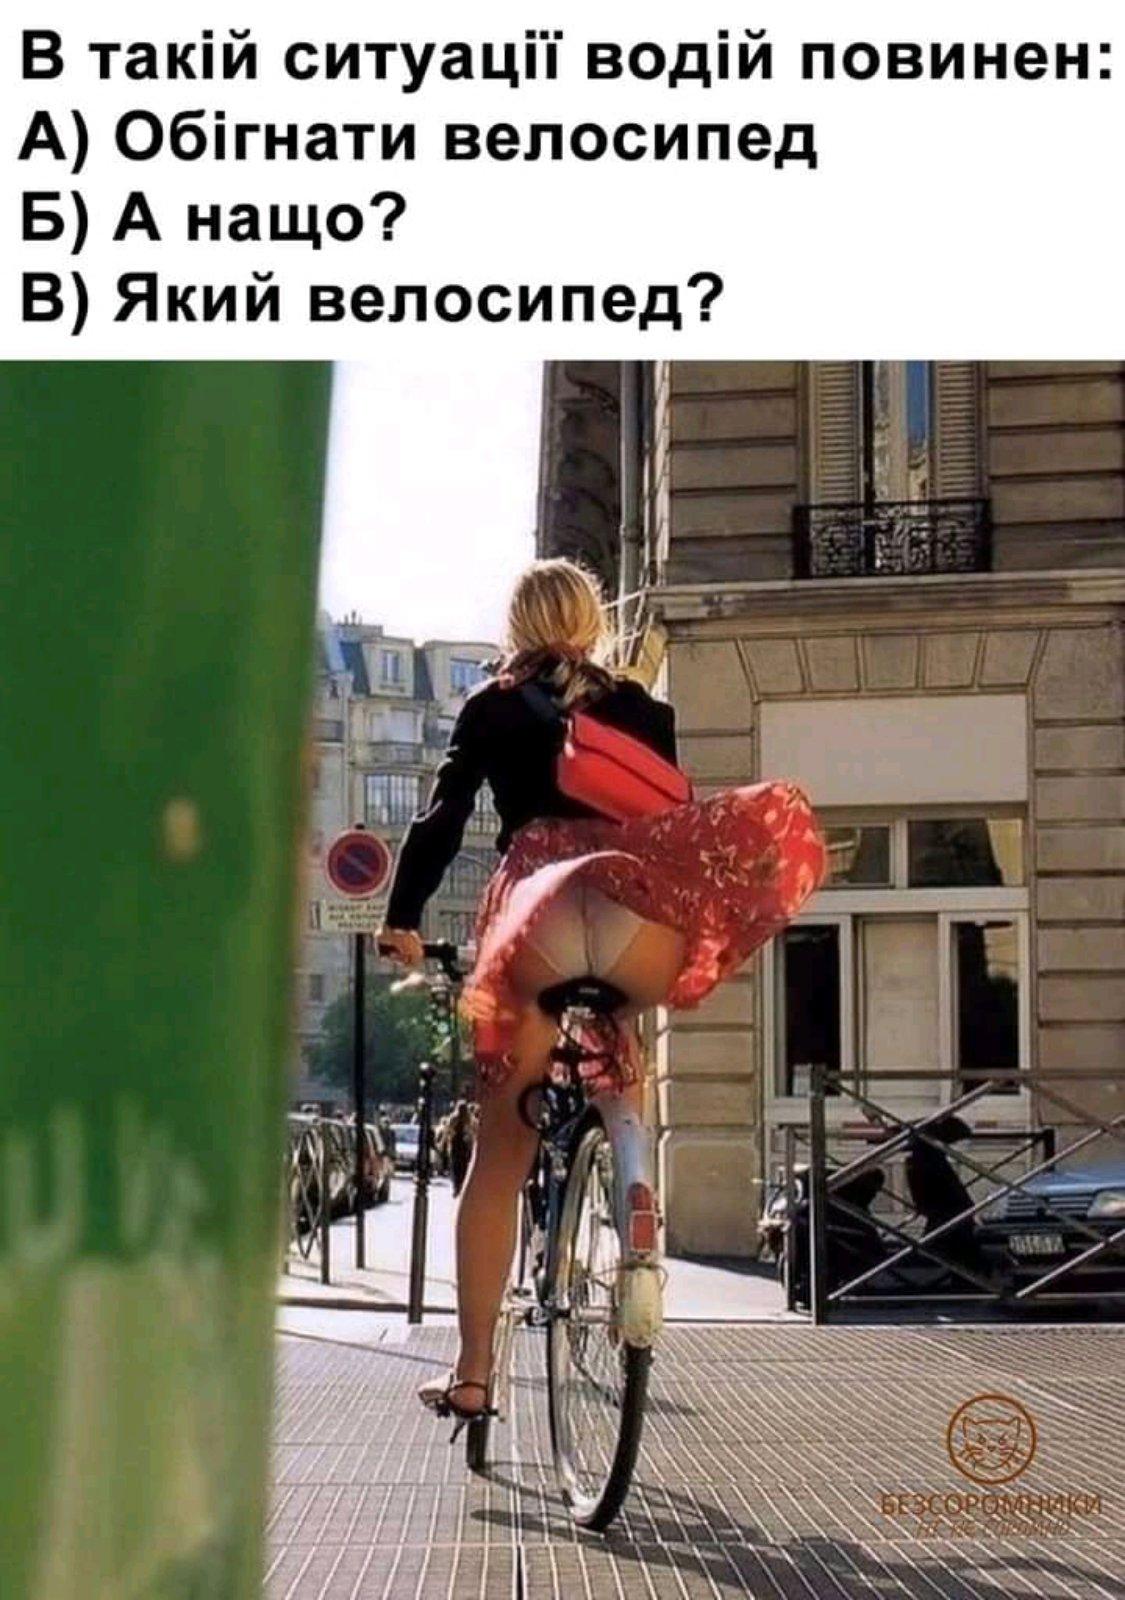 А где тут велосипед?